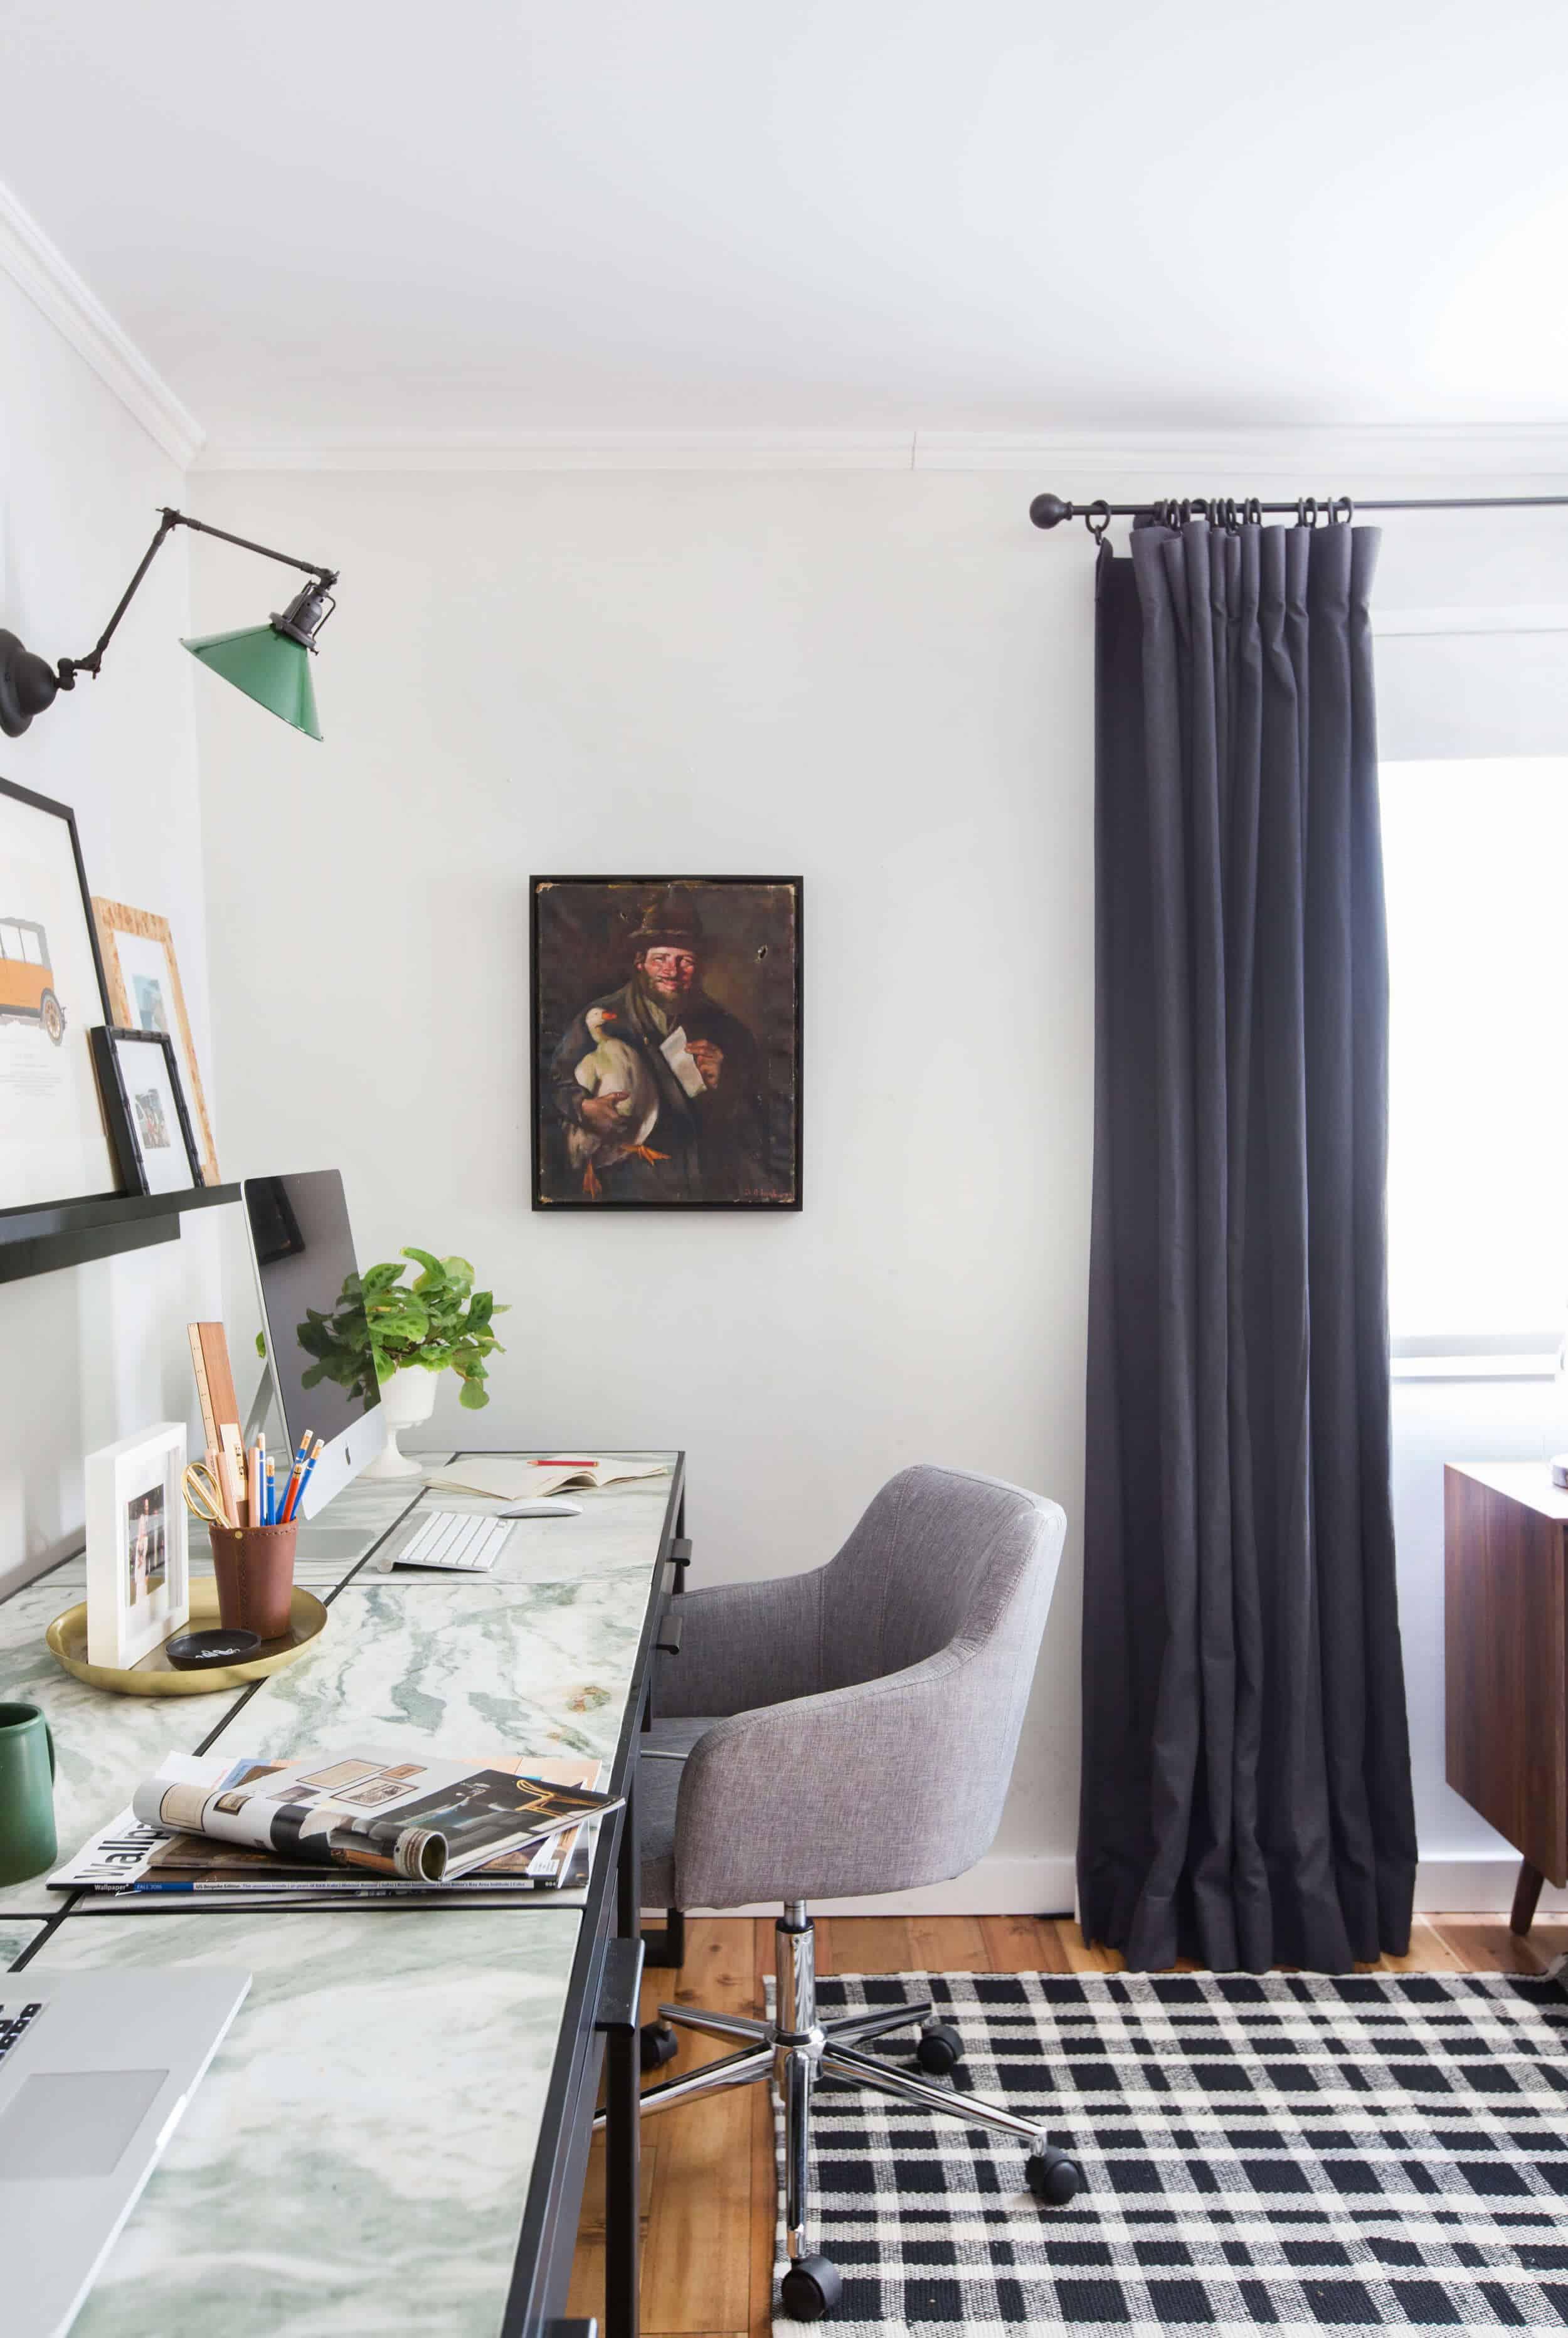 emily-henderson_framebridge_art-ledge_brians-office_masculine-office_guy_green_plaid-rug_workspace_modern_eclectic_12